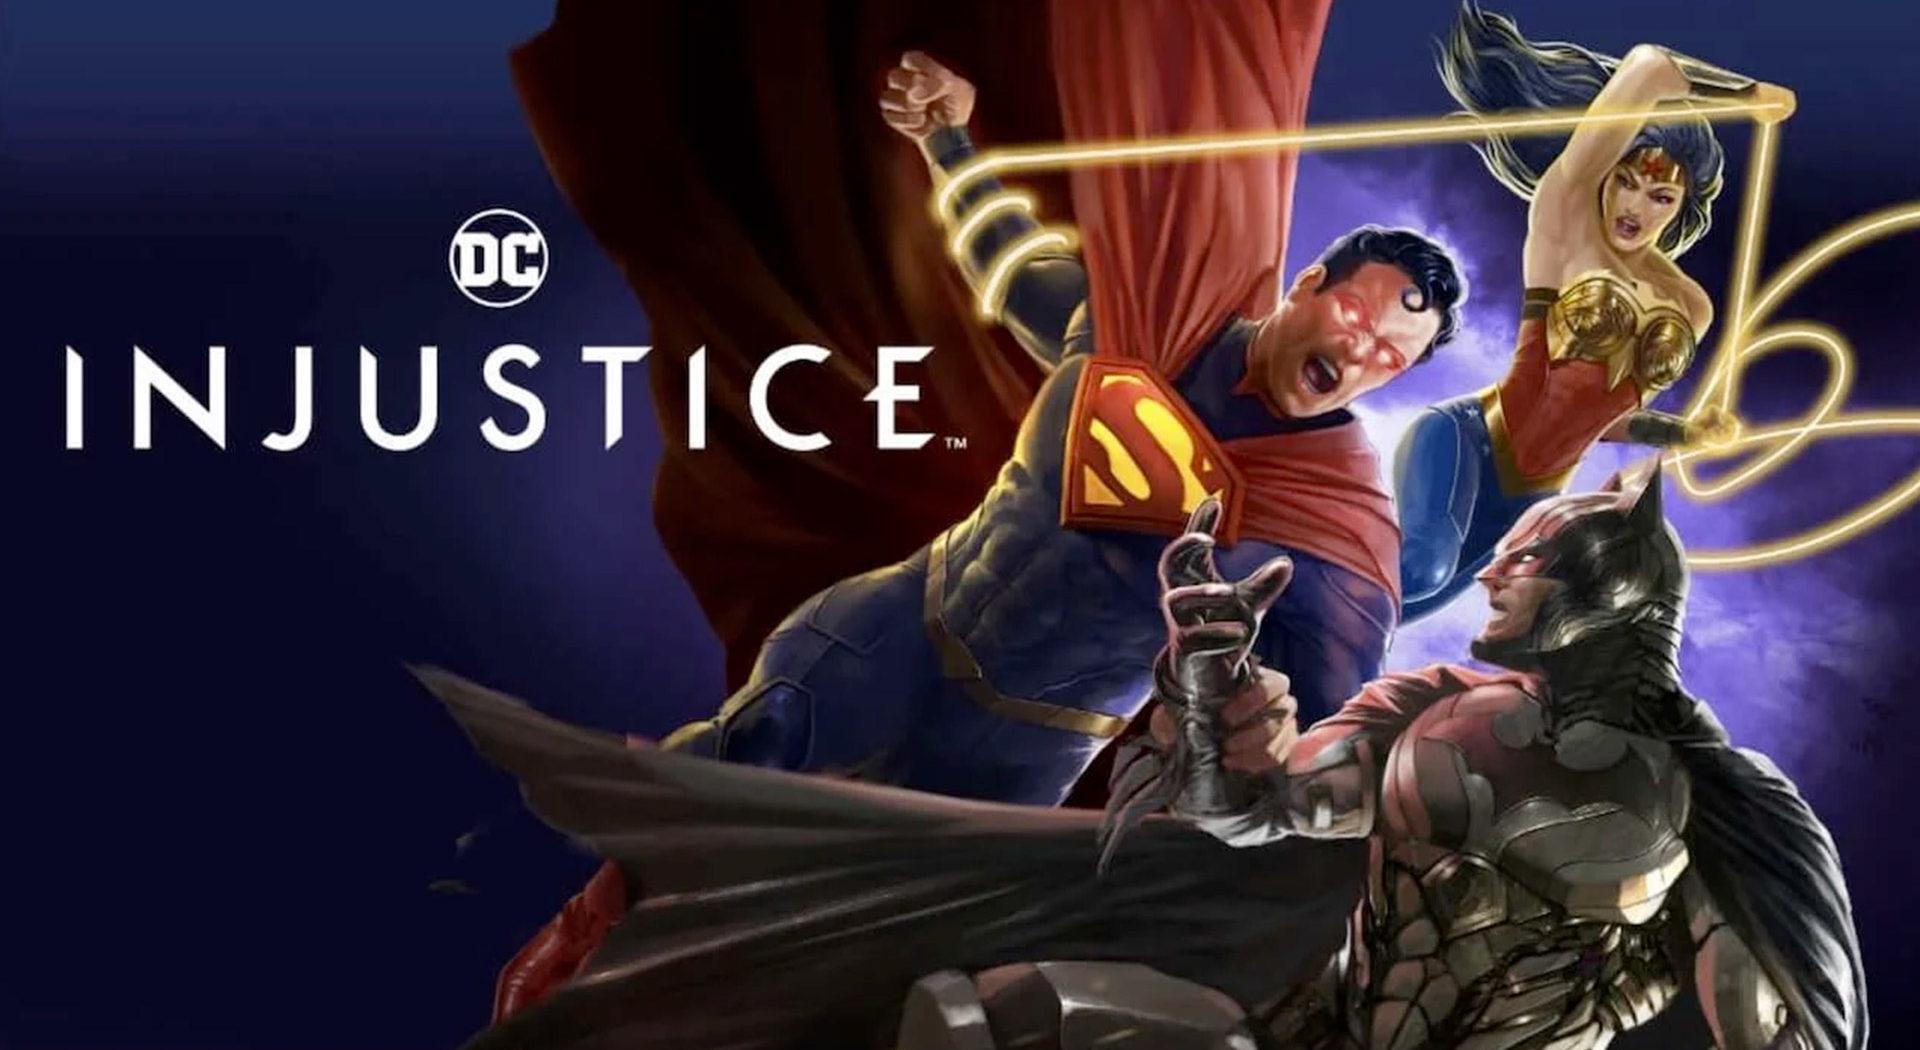 Injustice Animation Dc Comics ComicsOwl